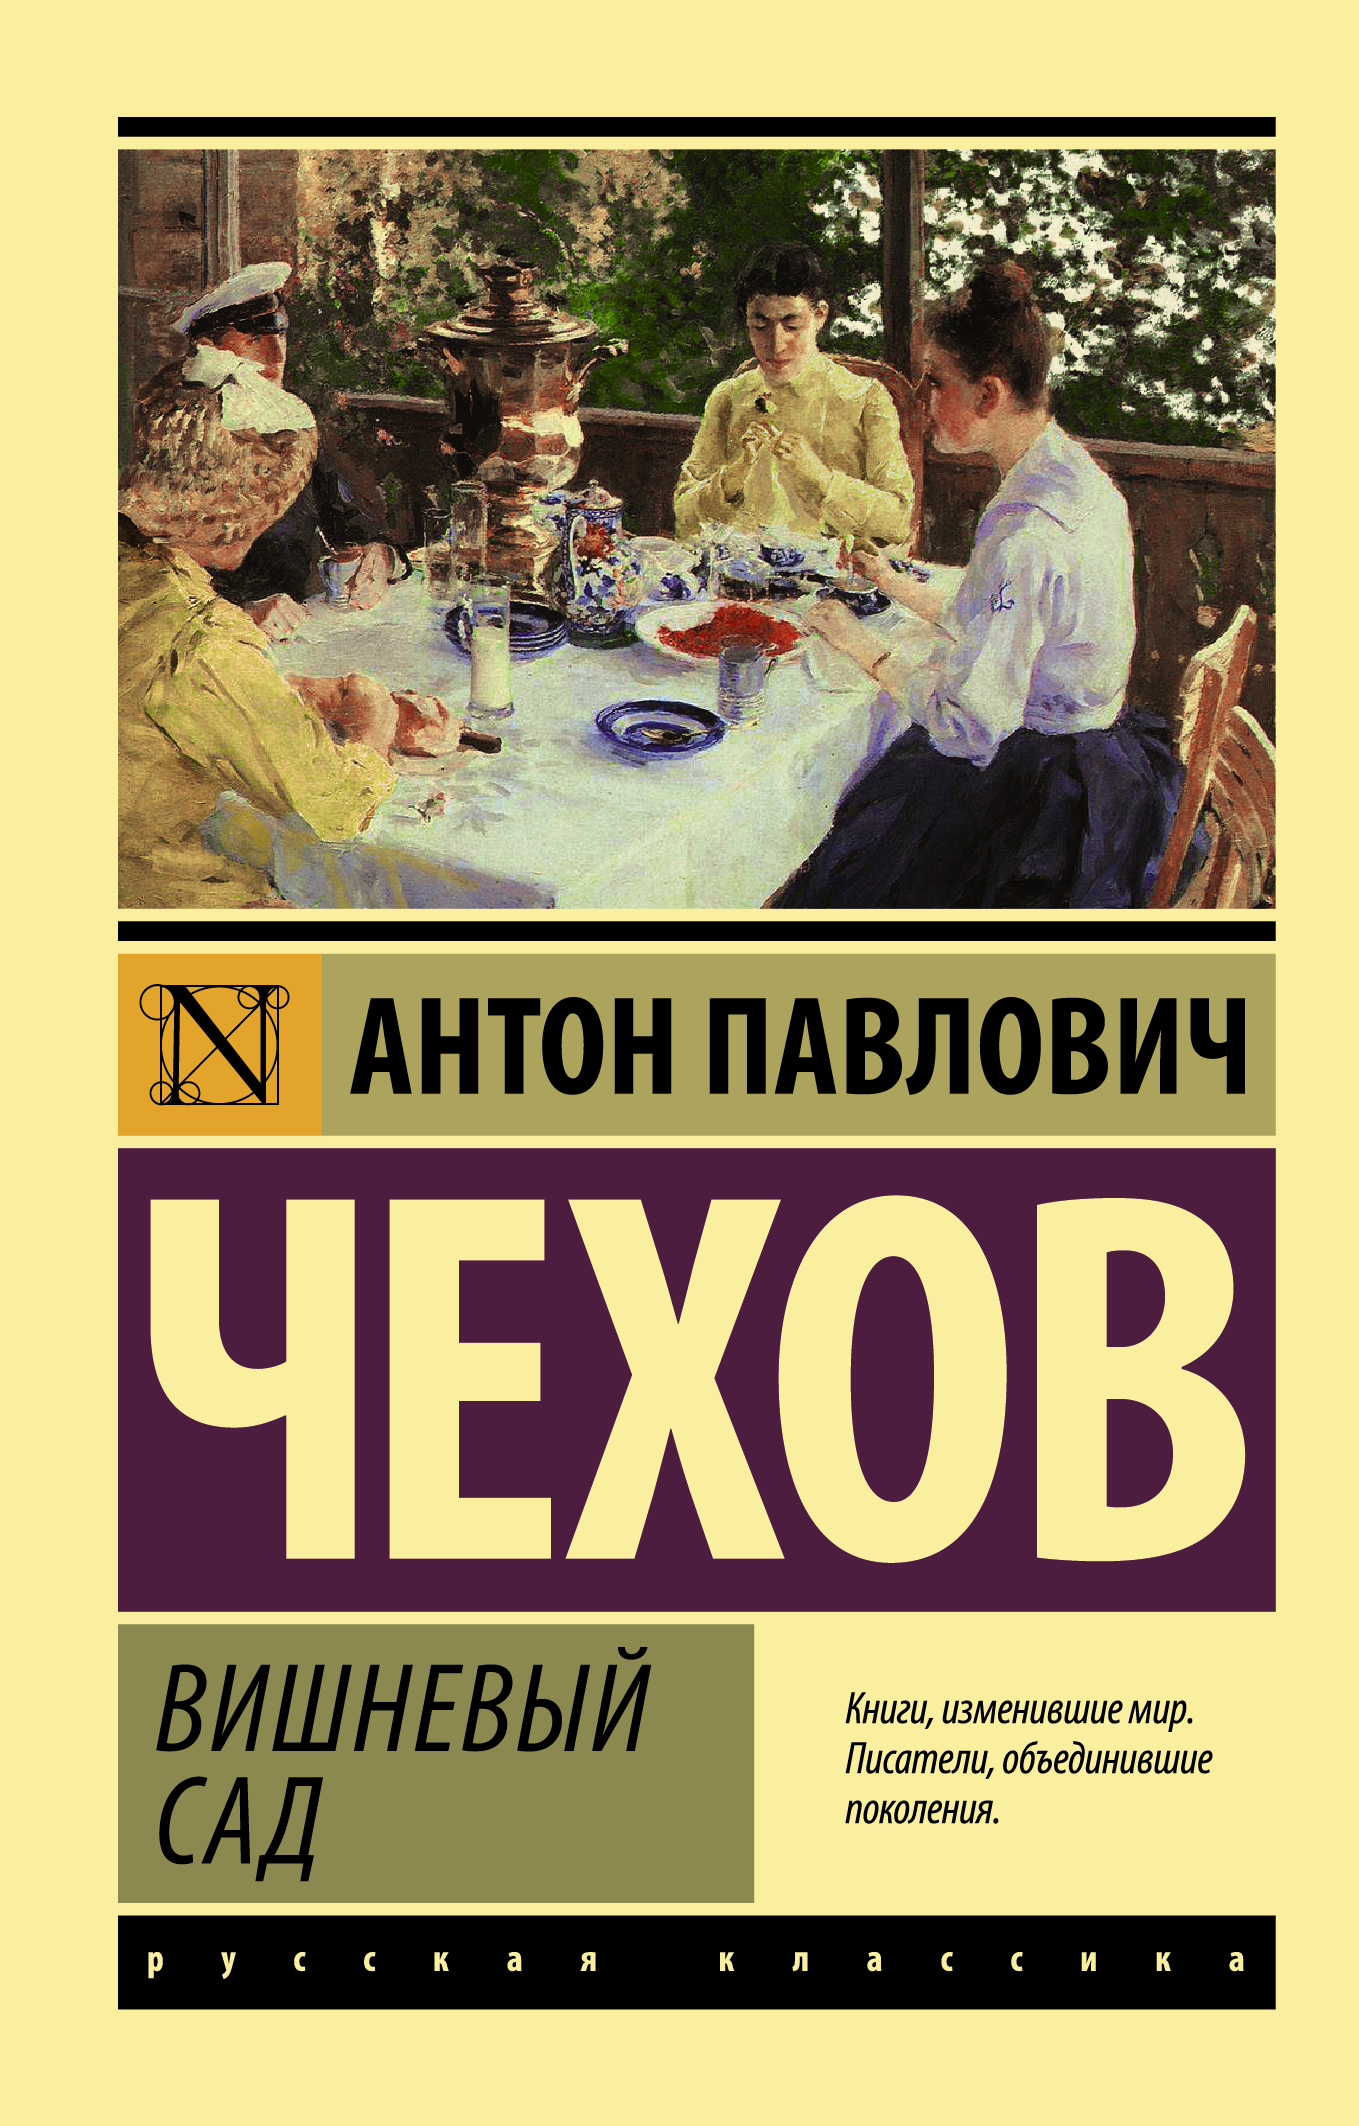 Вишневый сад ( Чехов Антон Павлович  )